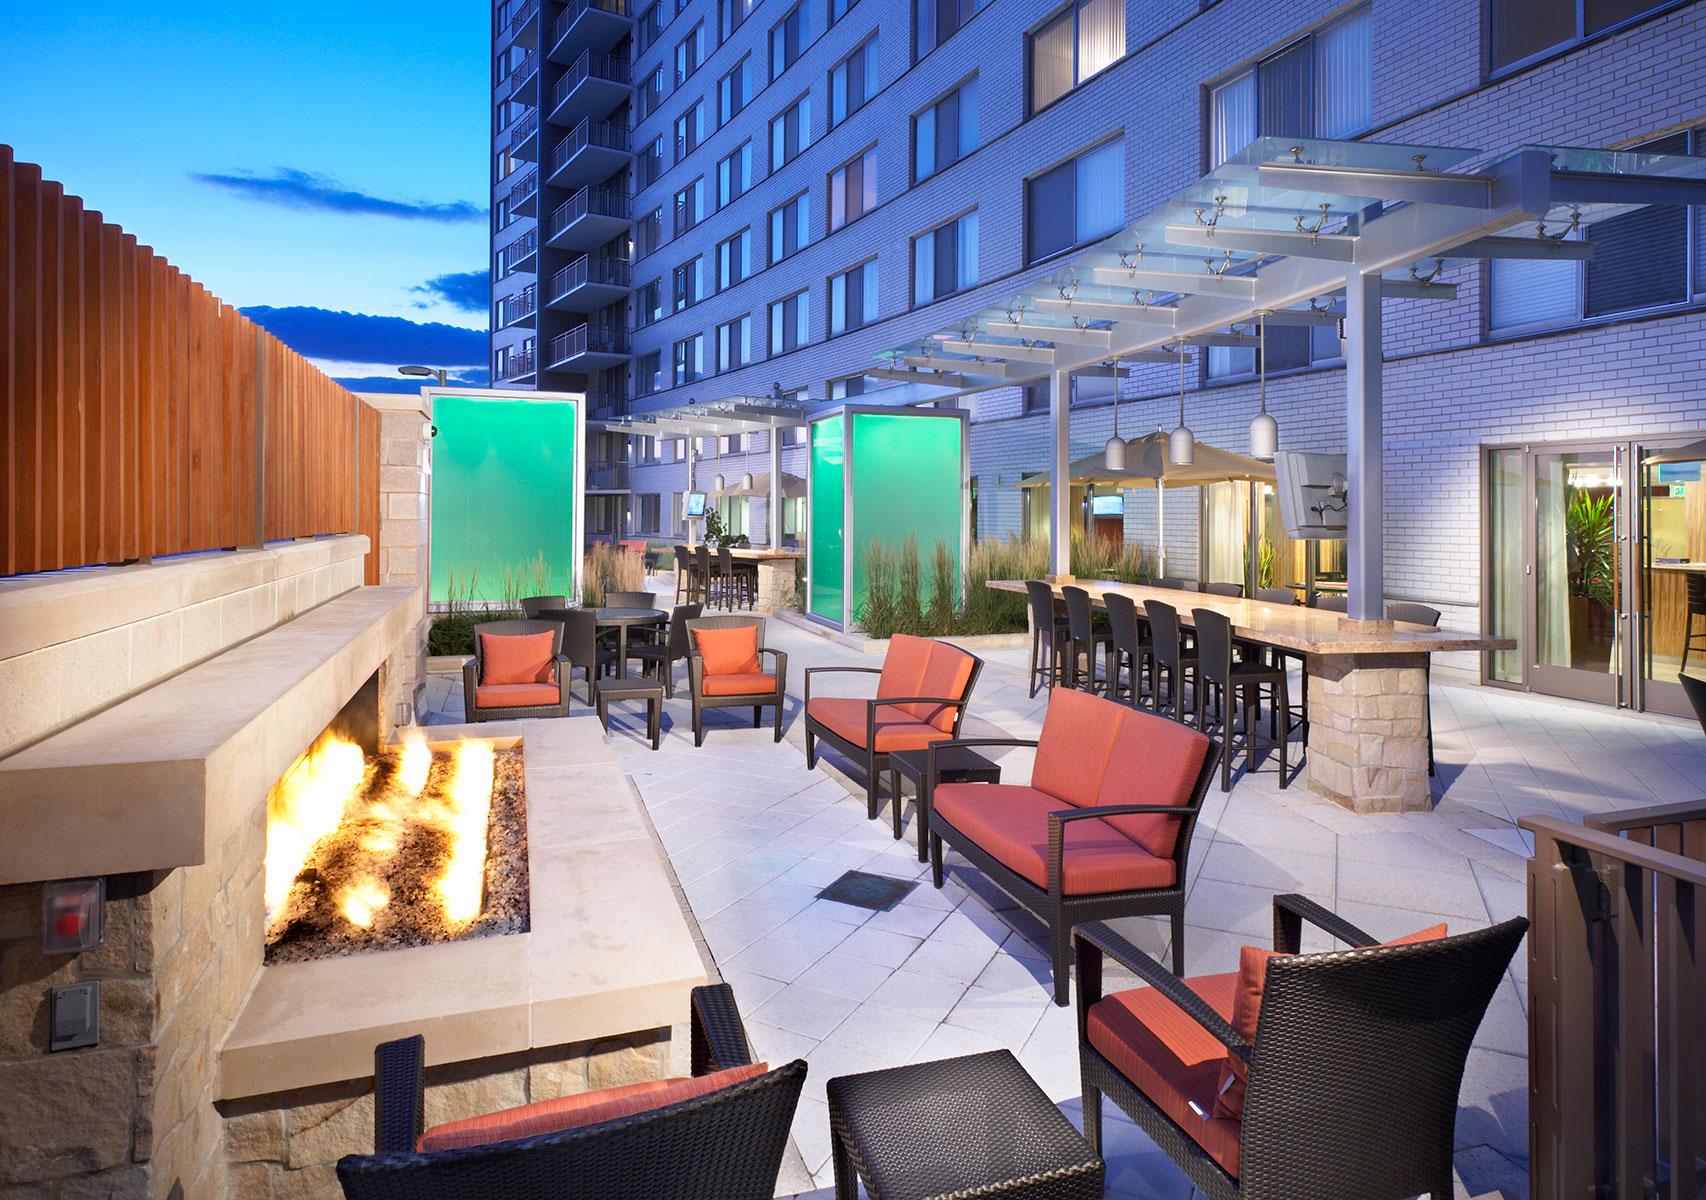 Blairs Lounge